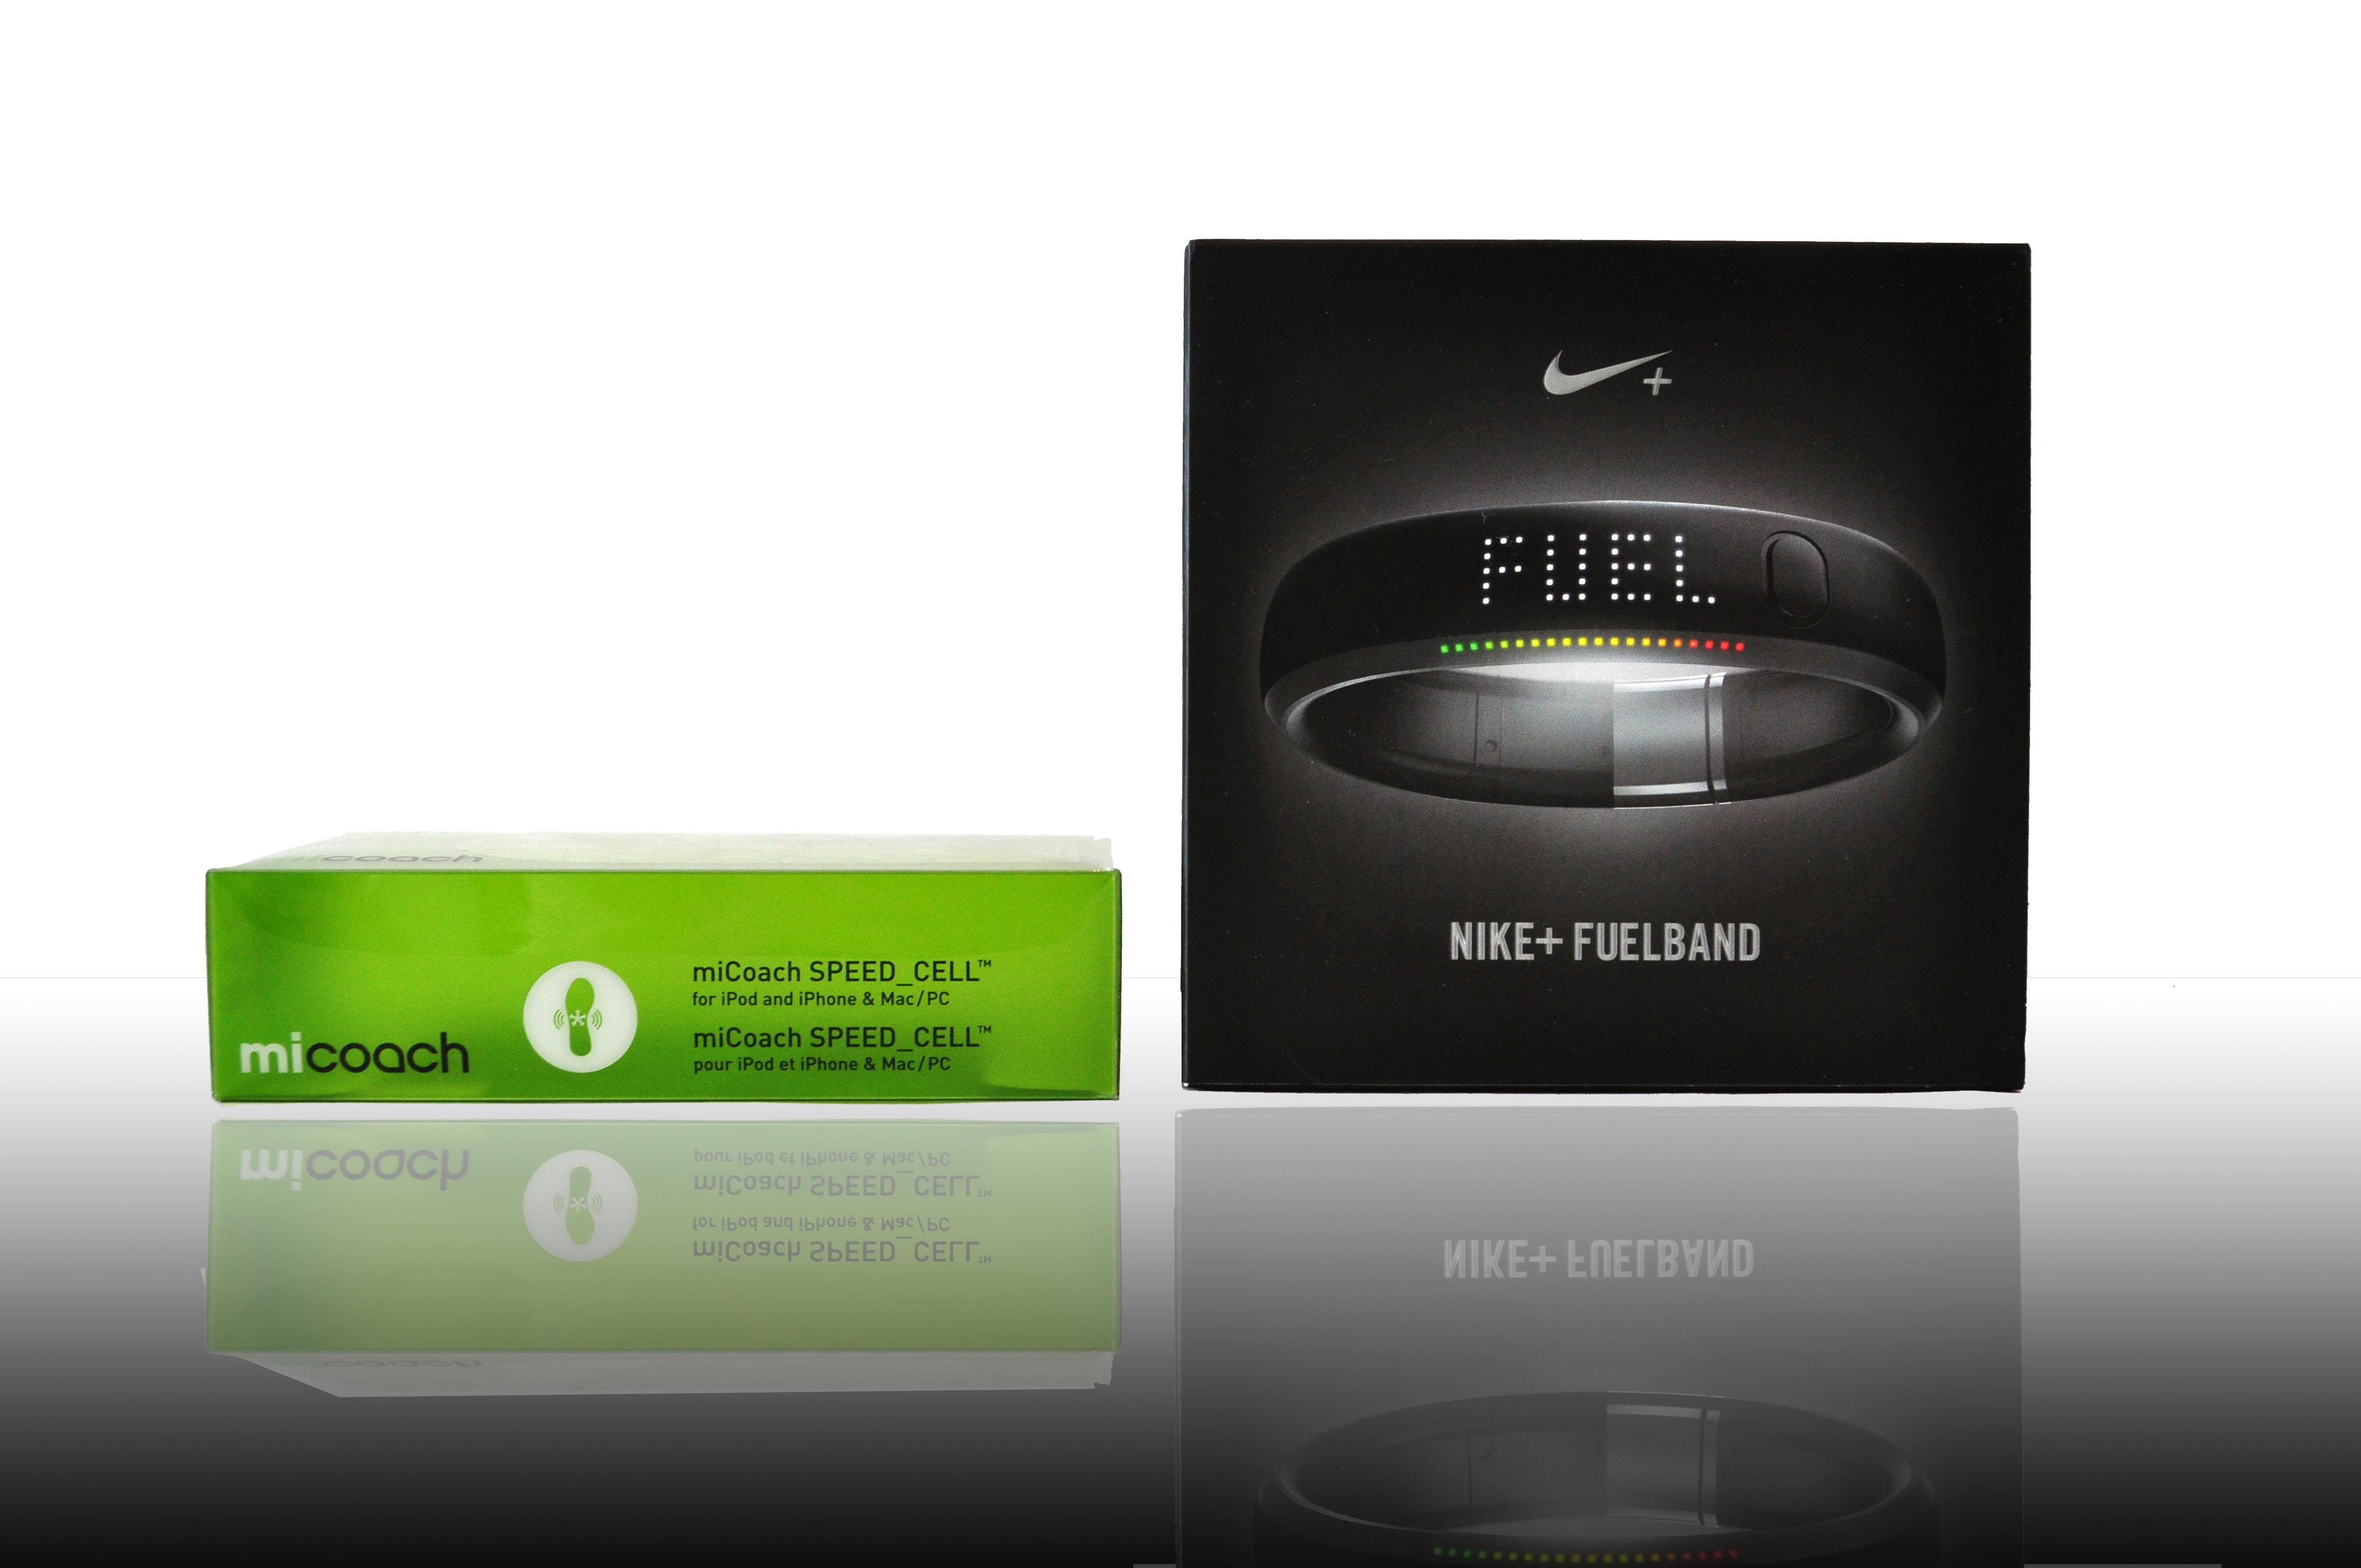 estrecho Cumplir ~ lado  Adidas MiCoach v Nike Fuel Band | Goals and Gear